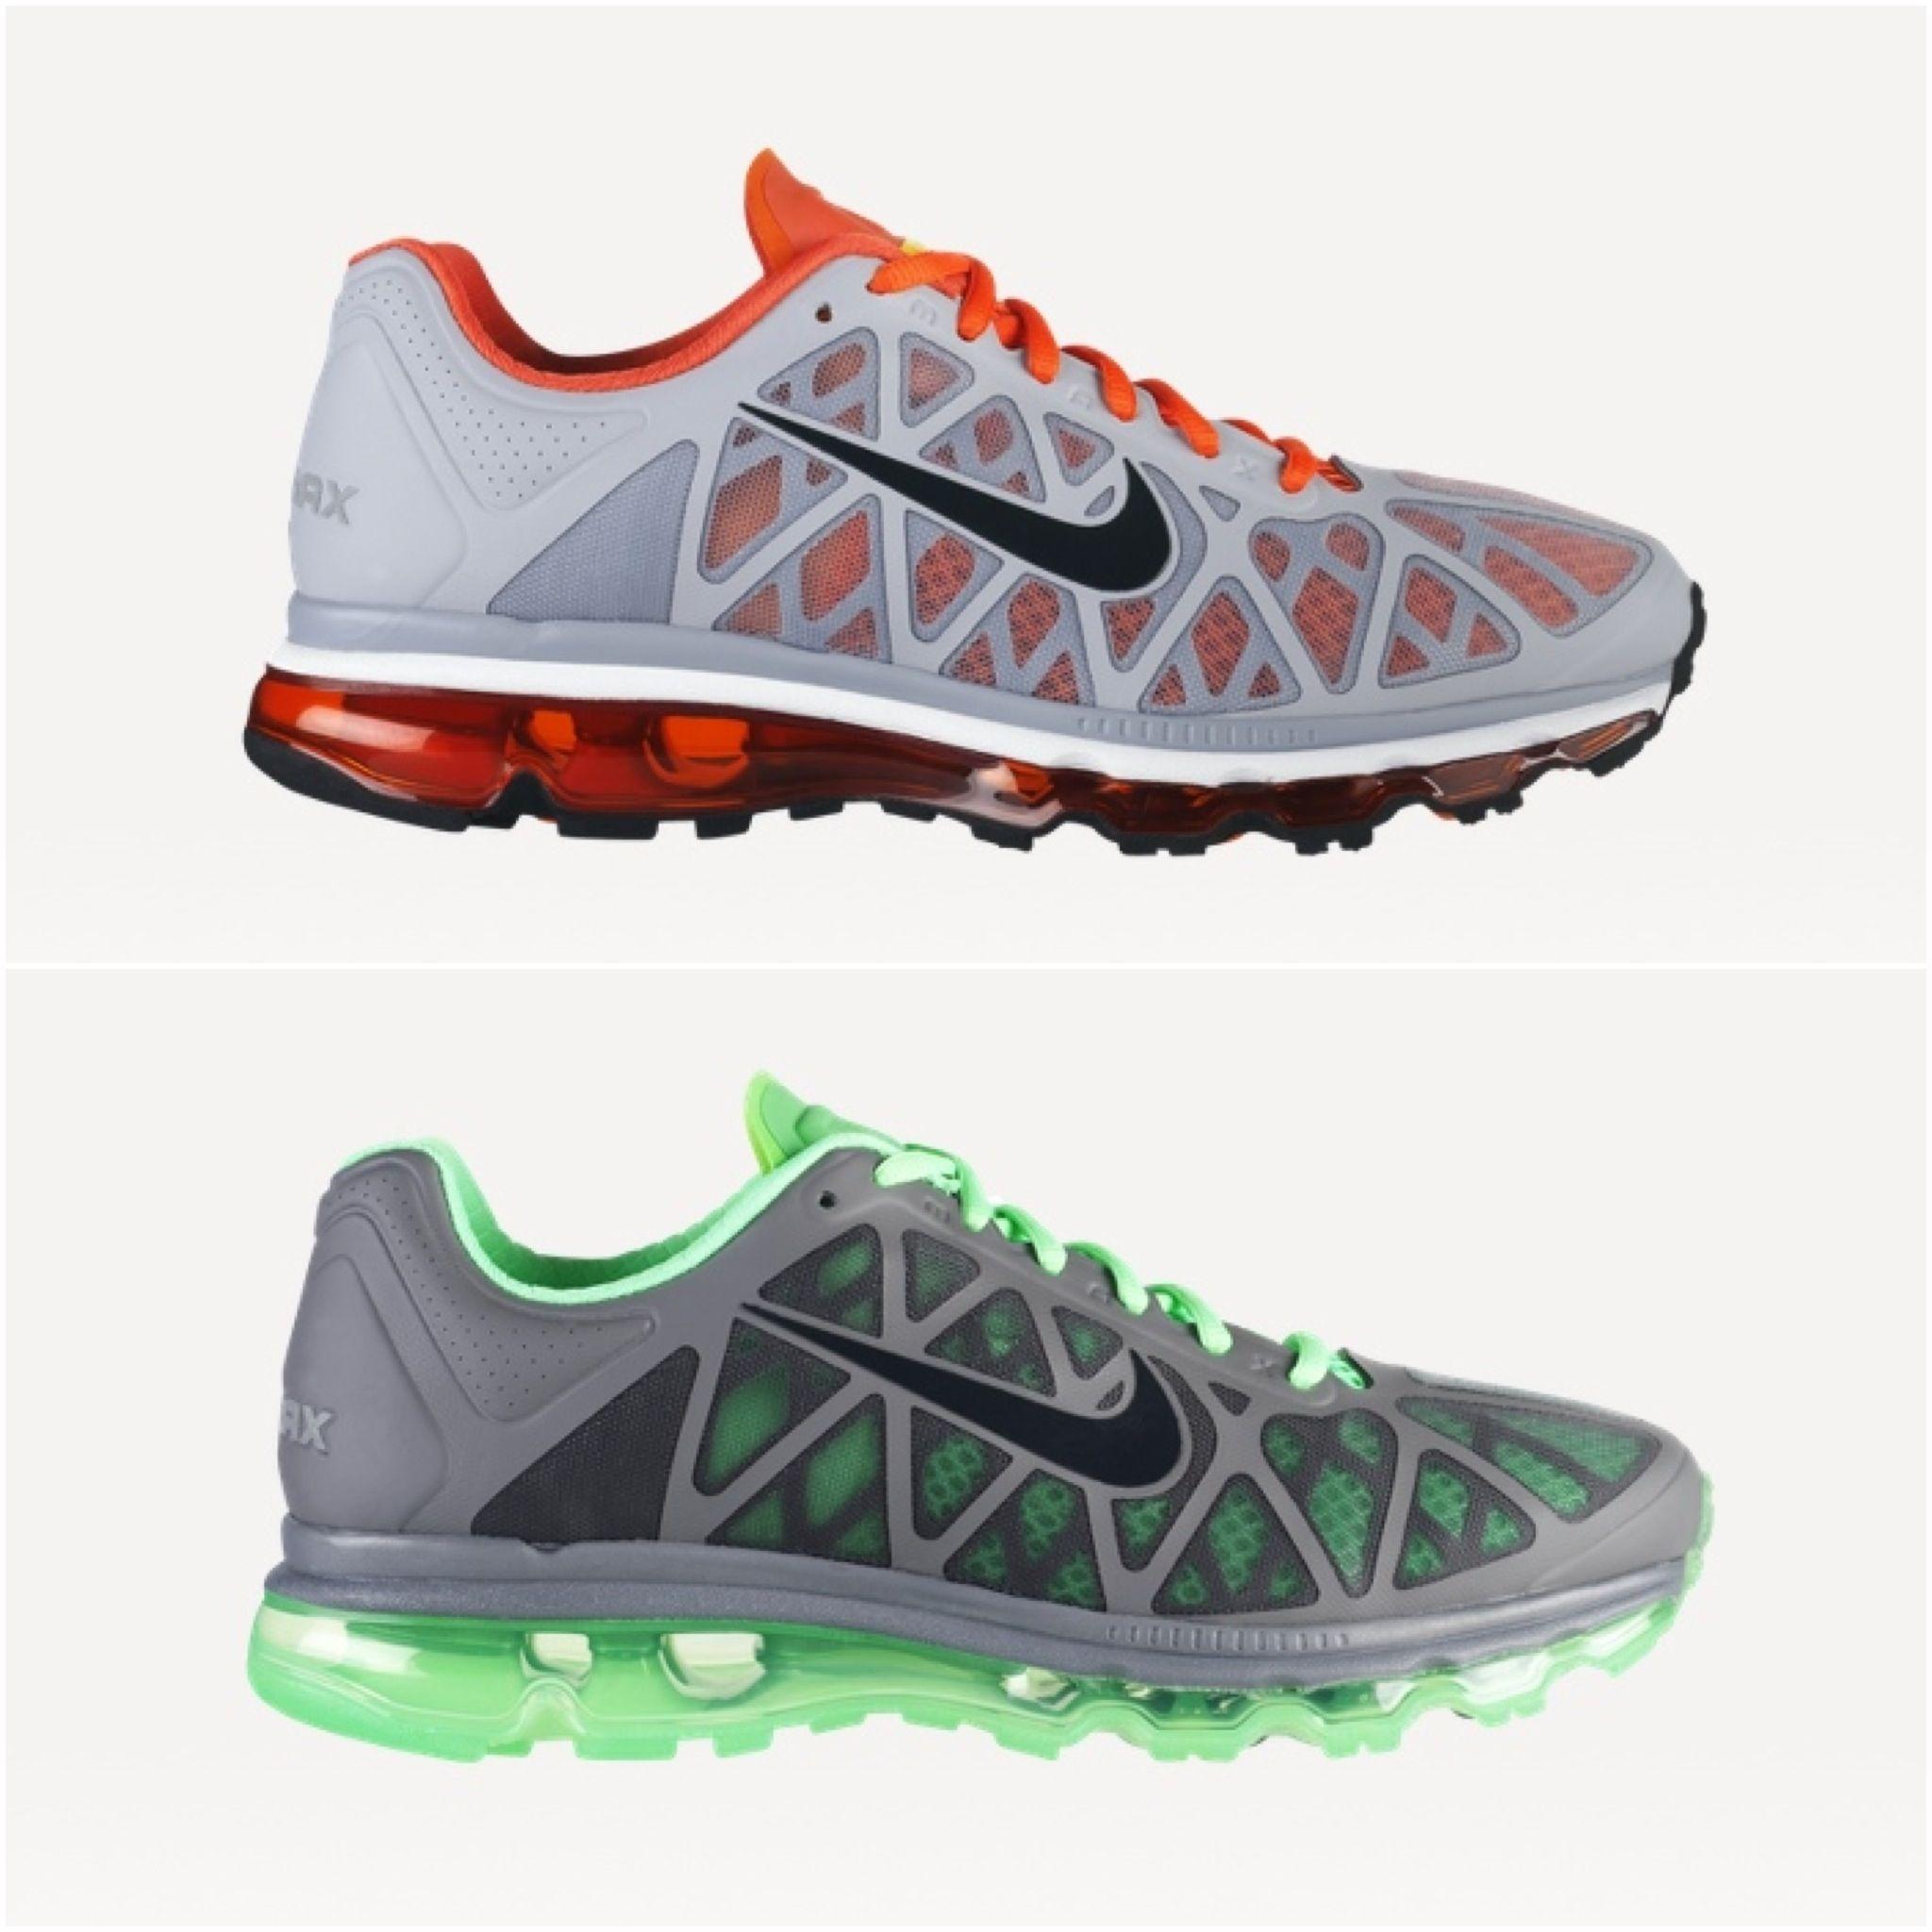 Tous Les Modèles Nike Free Run Dysfonctionnements